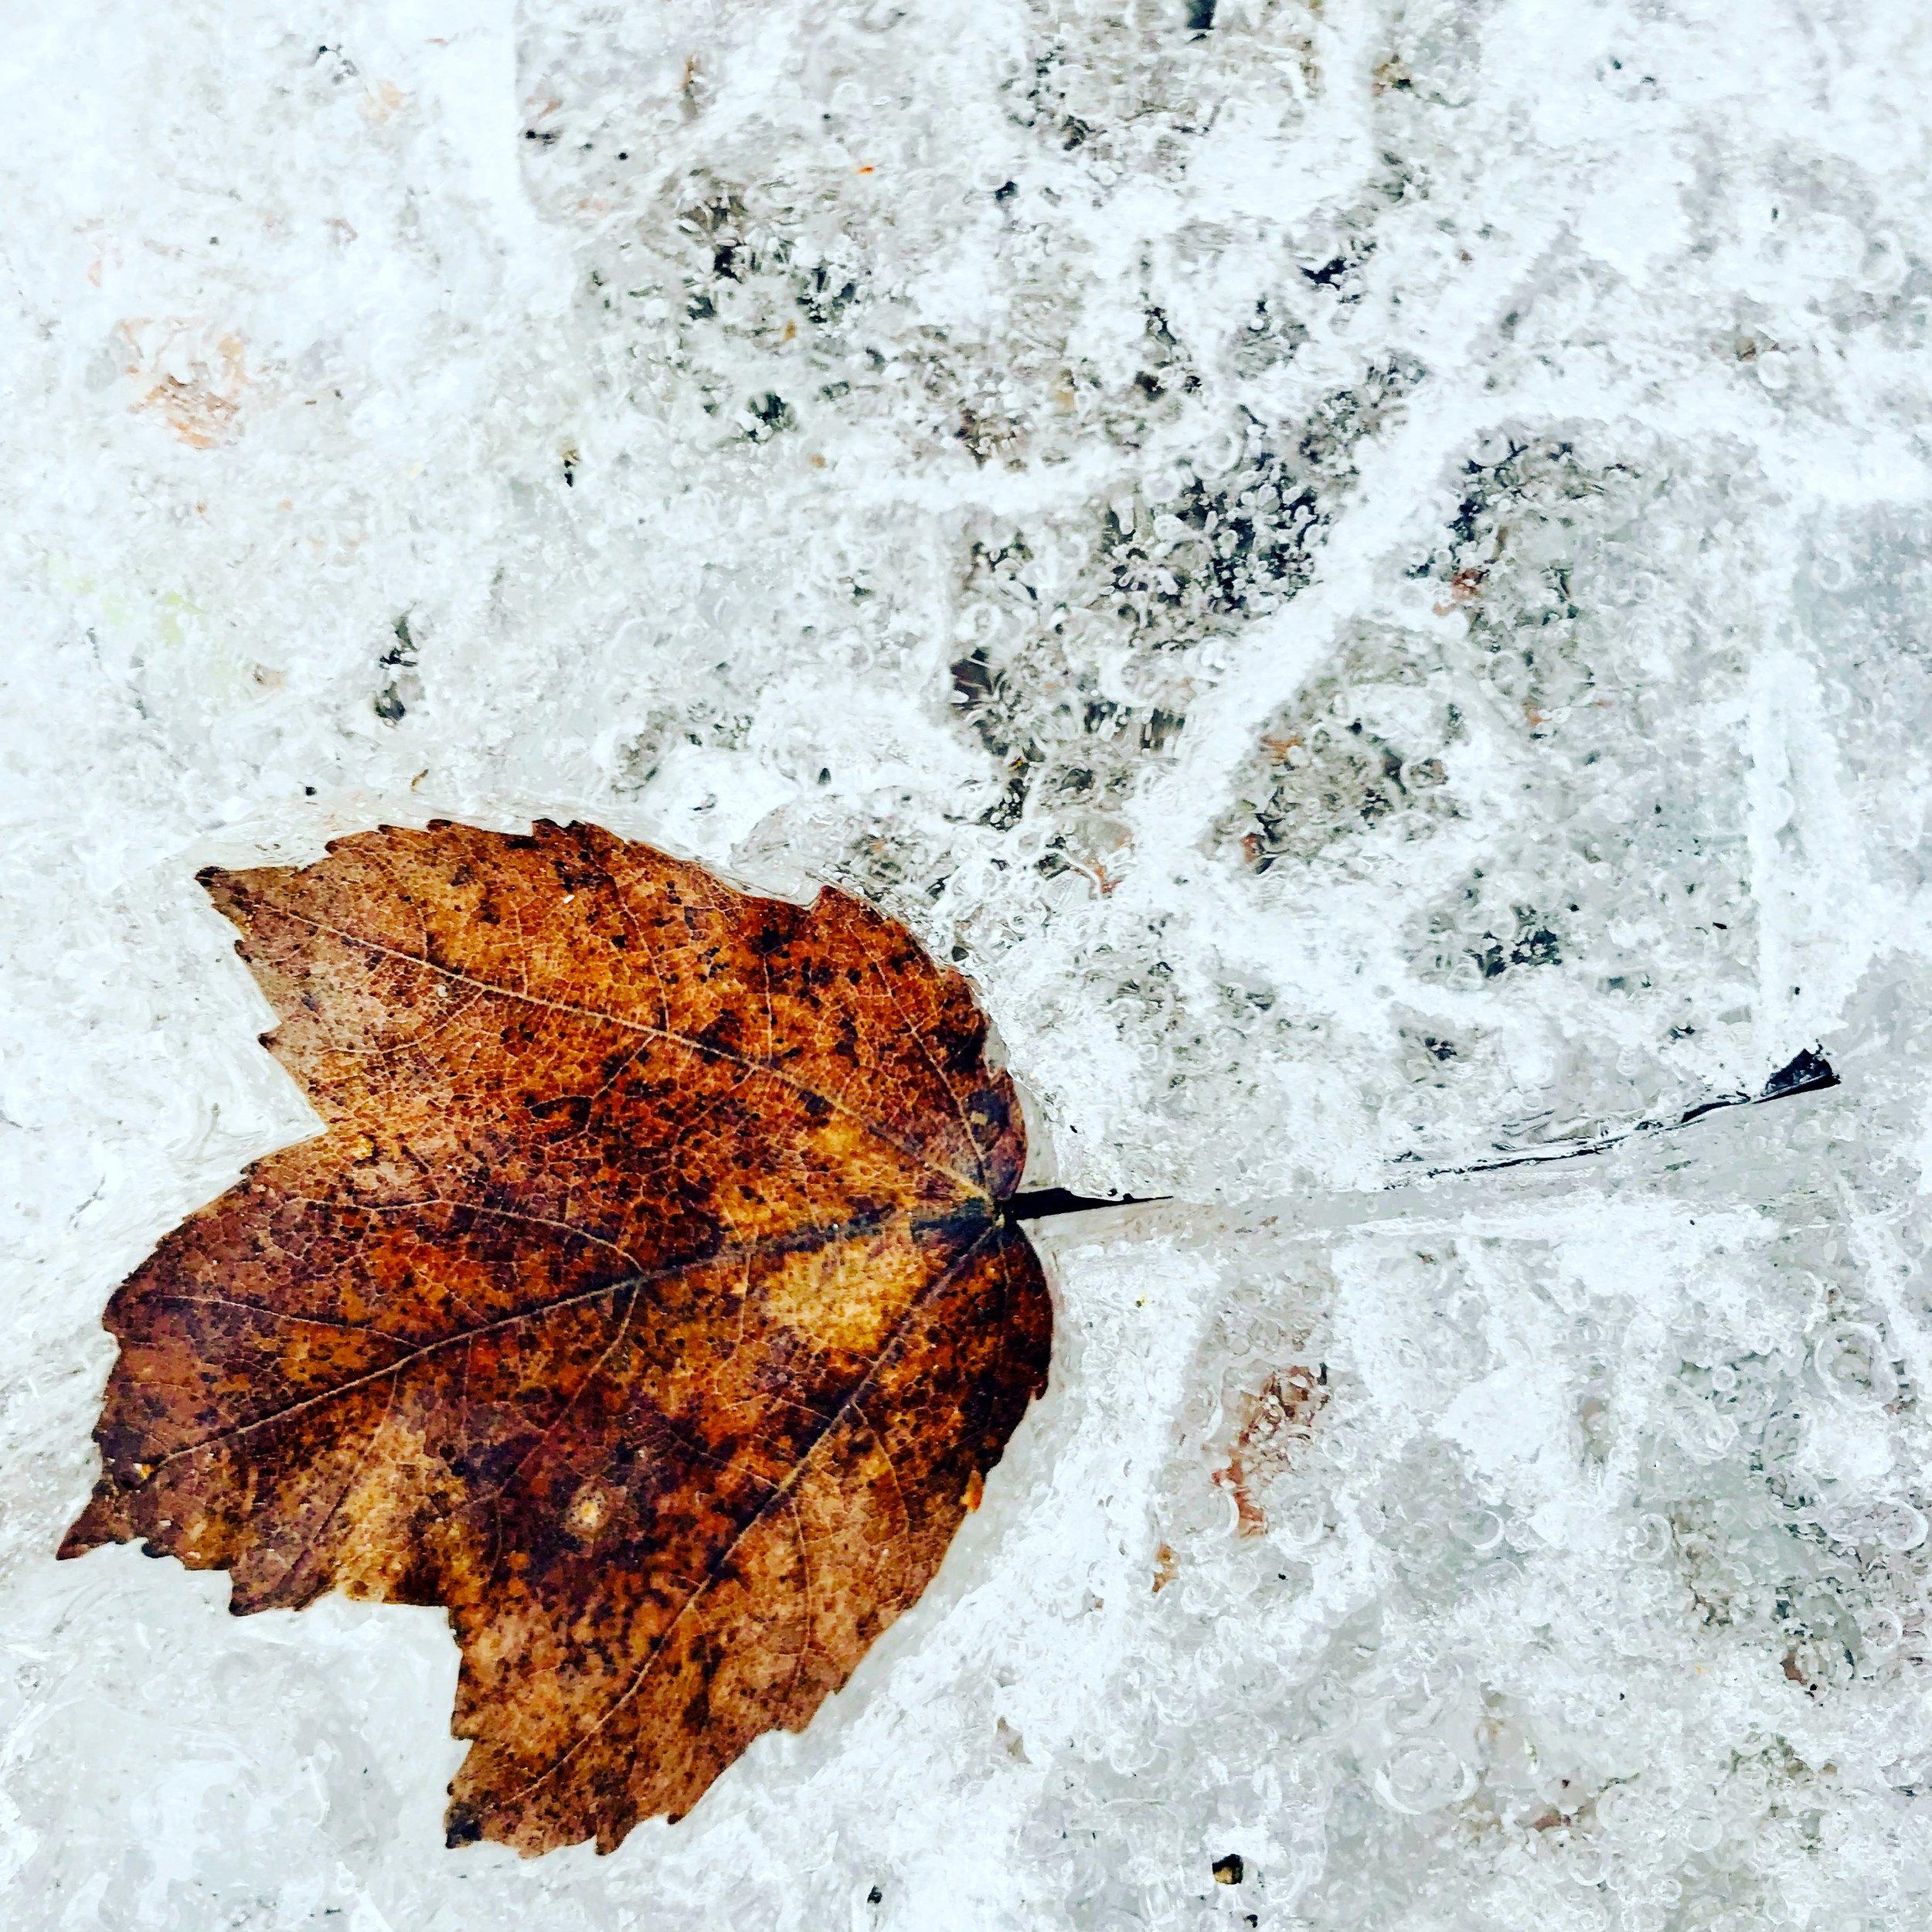 frozen leaf.JPG